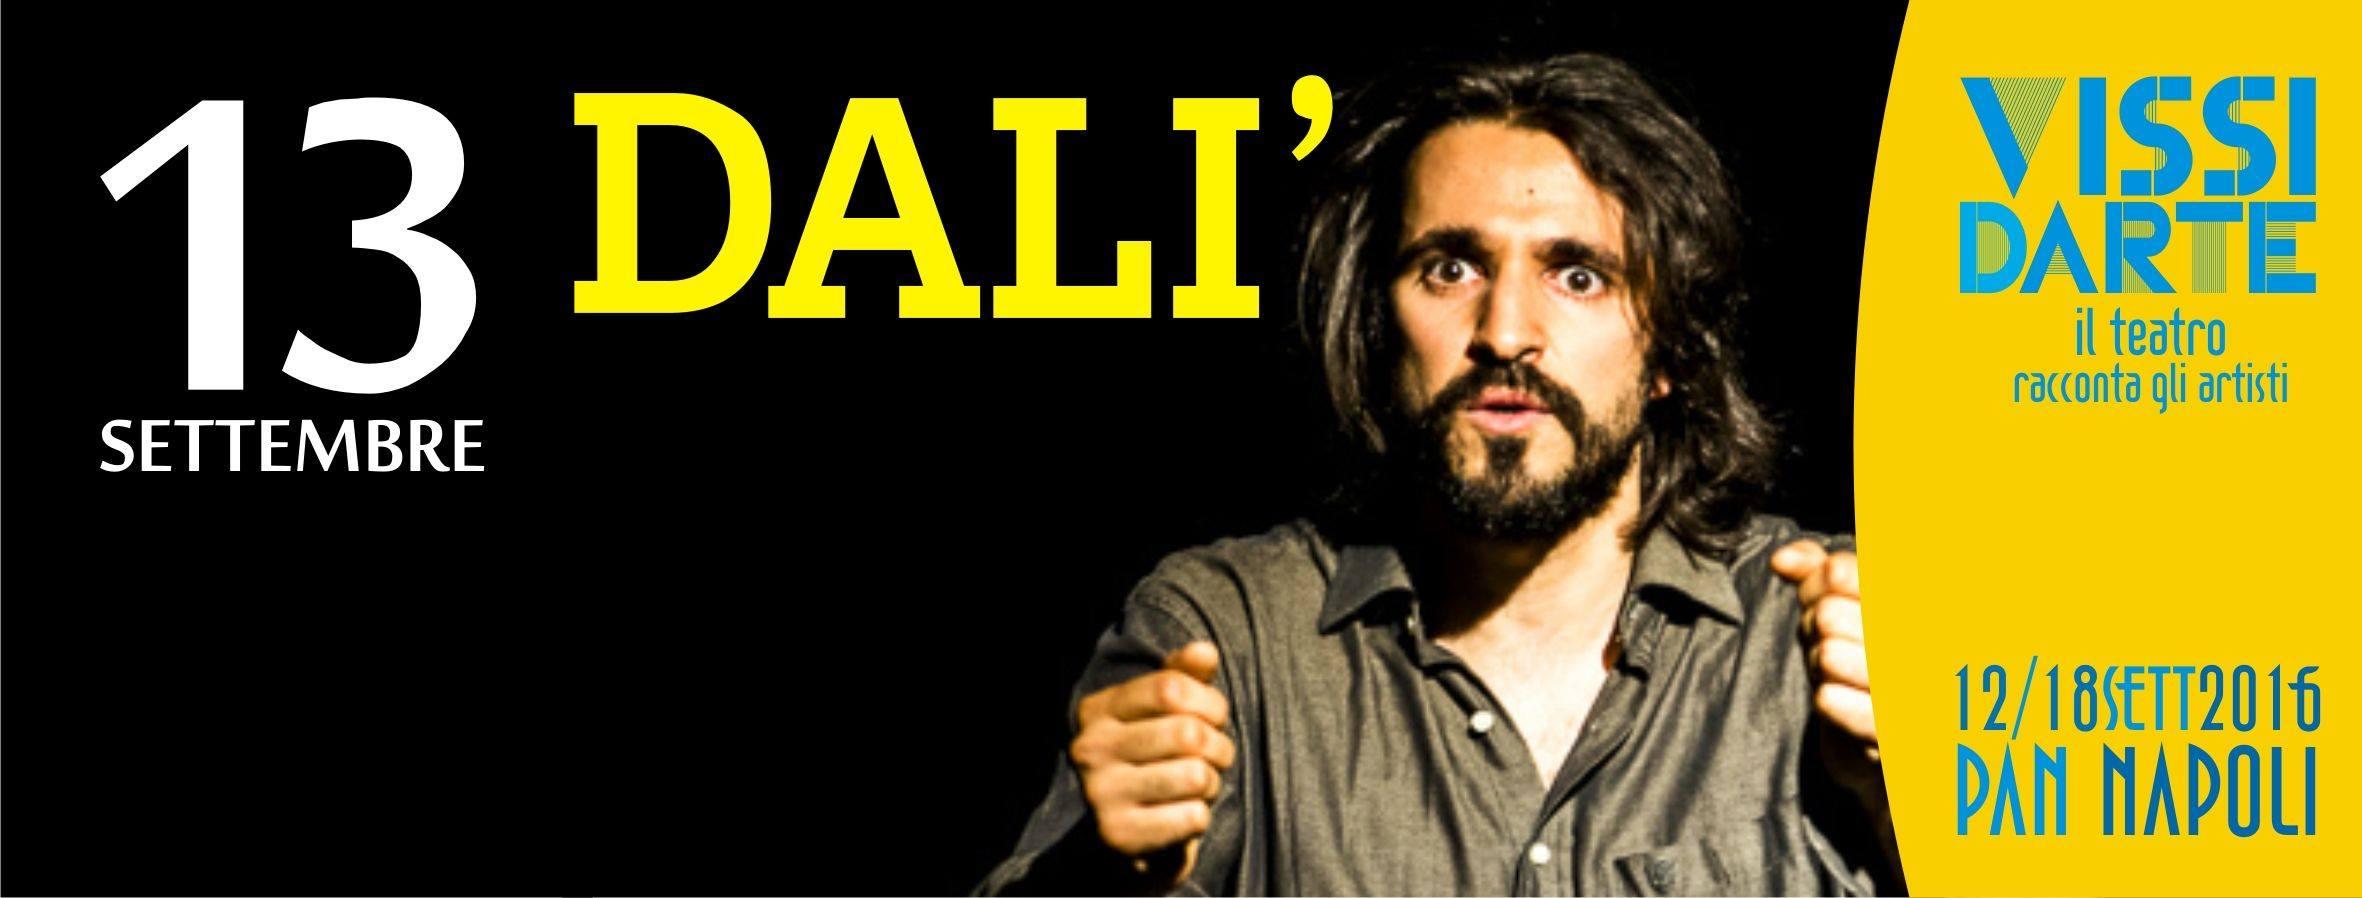 Vissidarte: Stasera va in scena Salvador Dalì